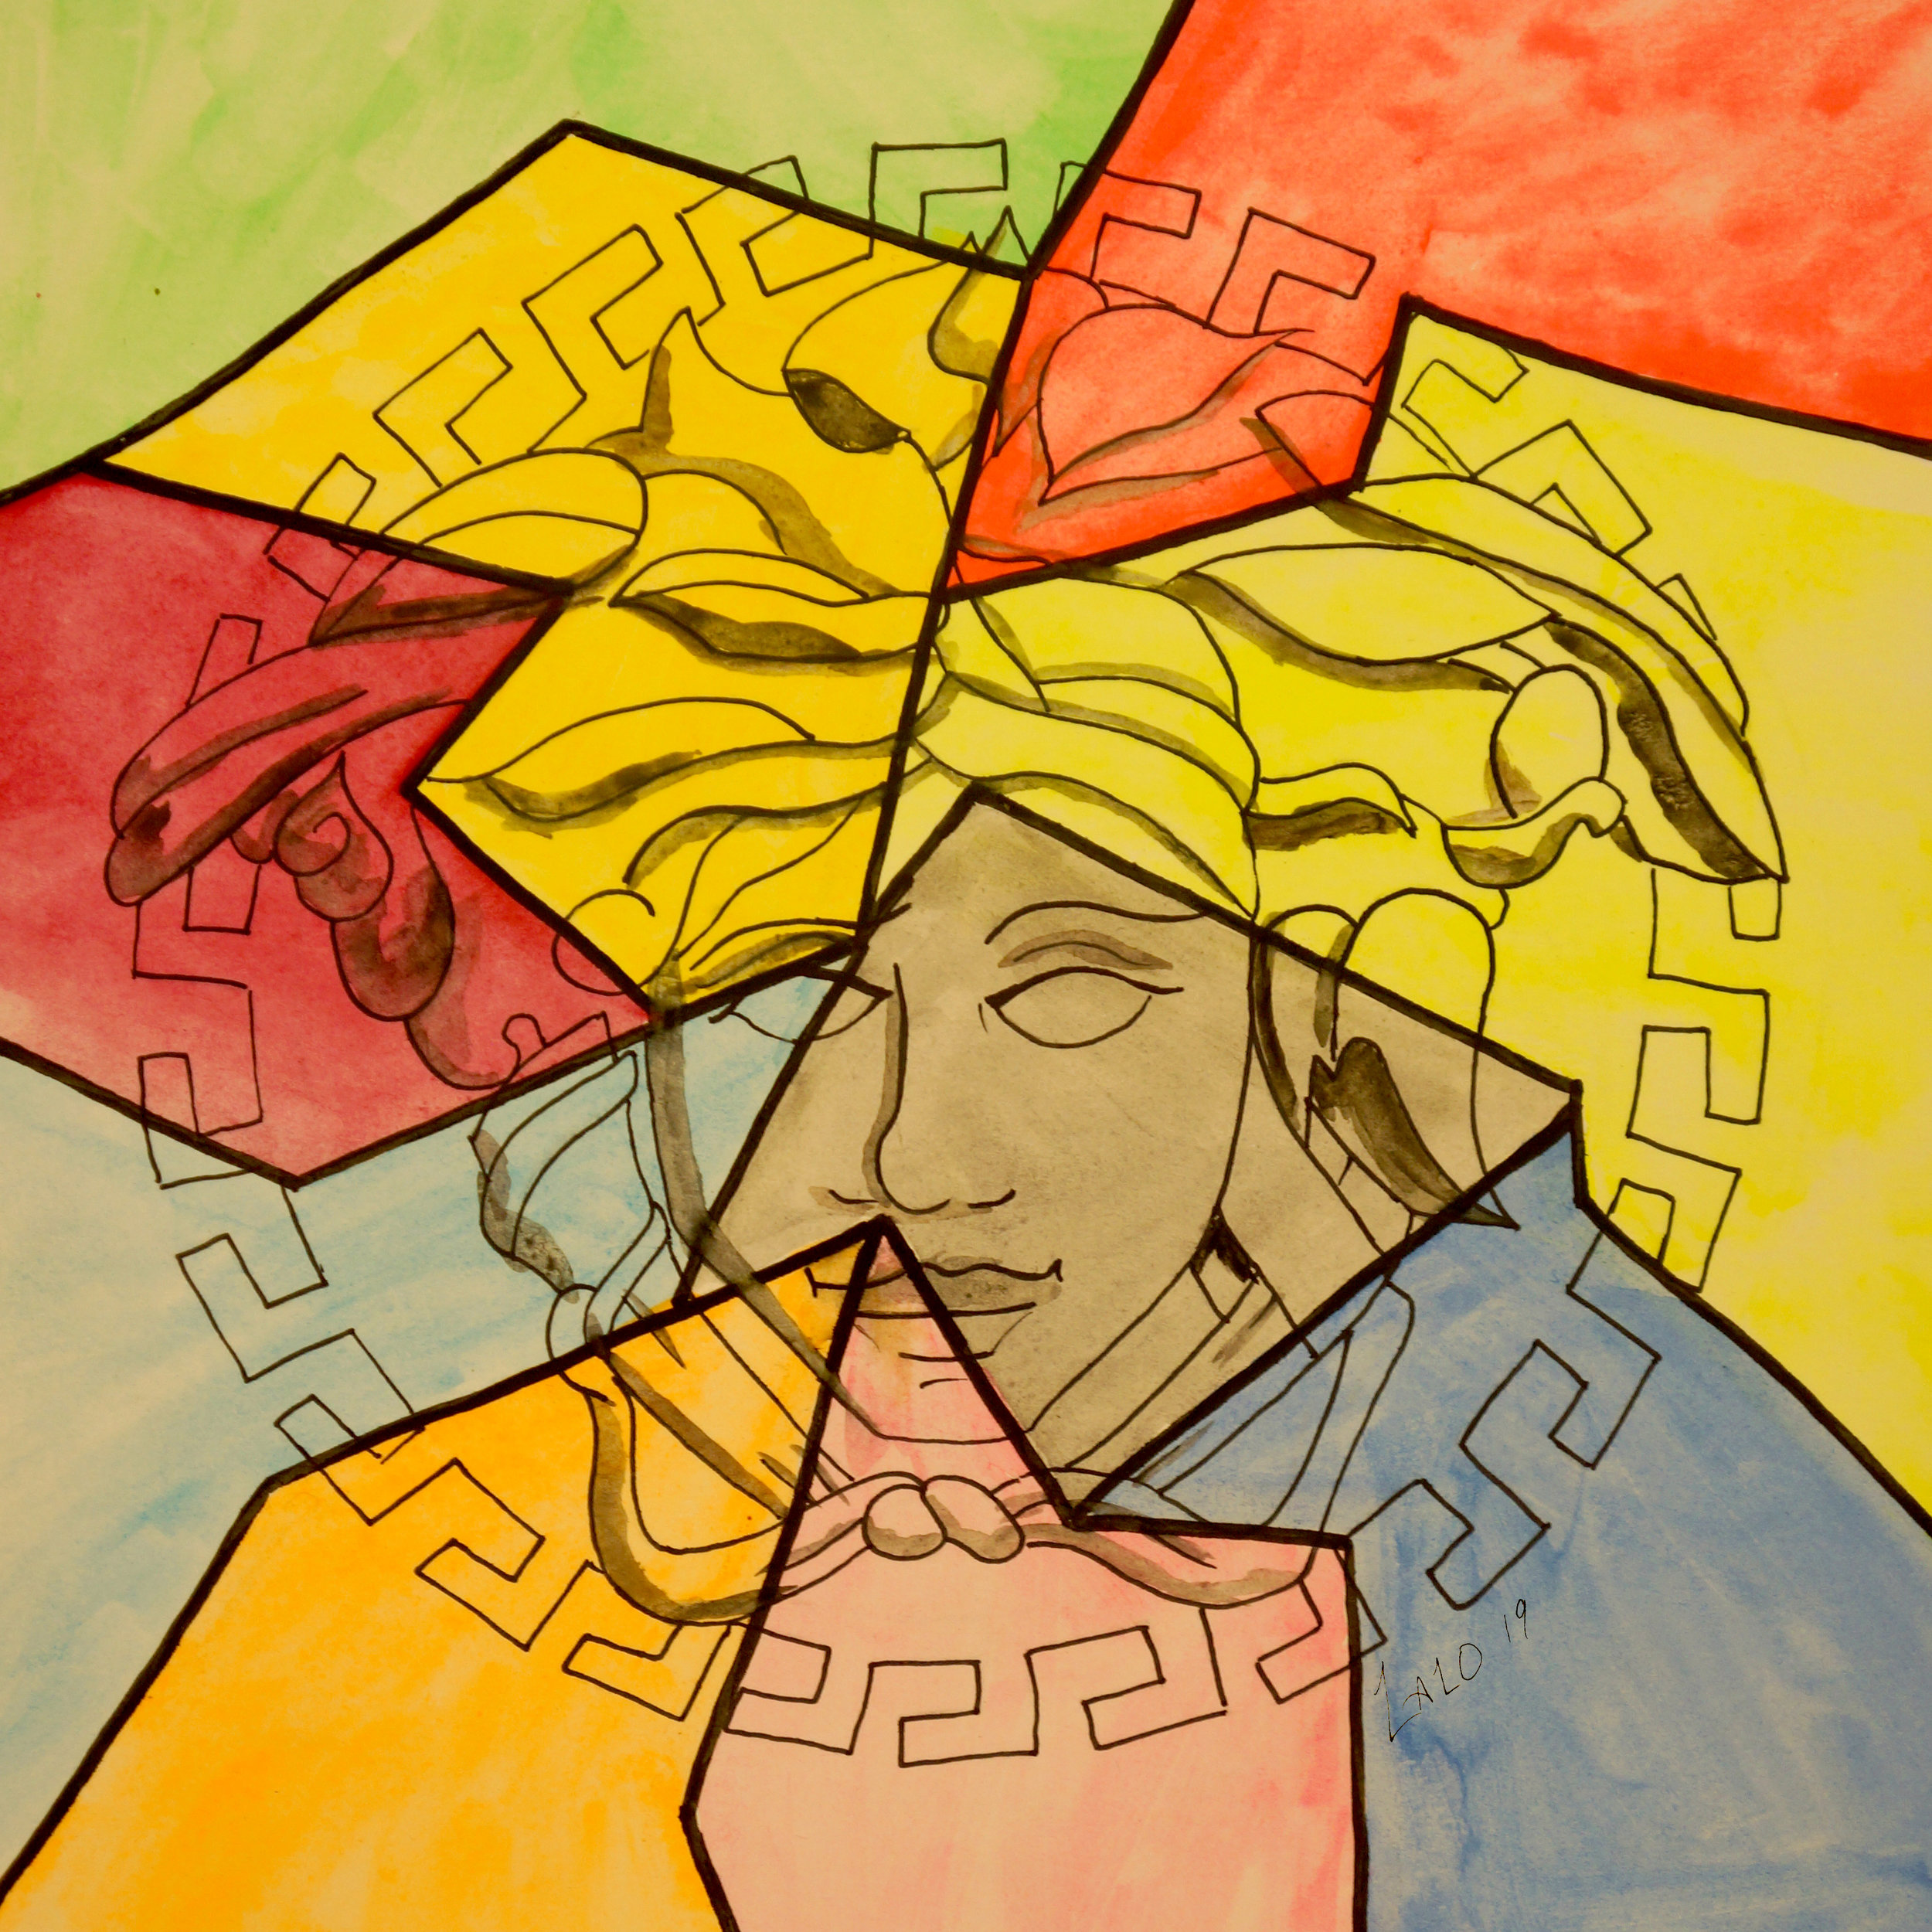 Artist: David Ybarbo III